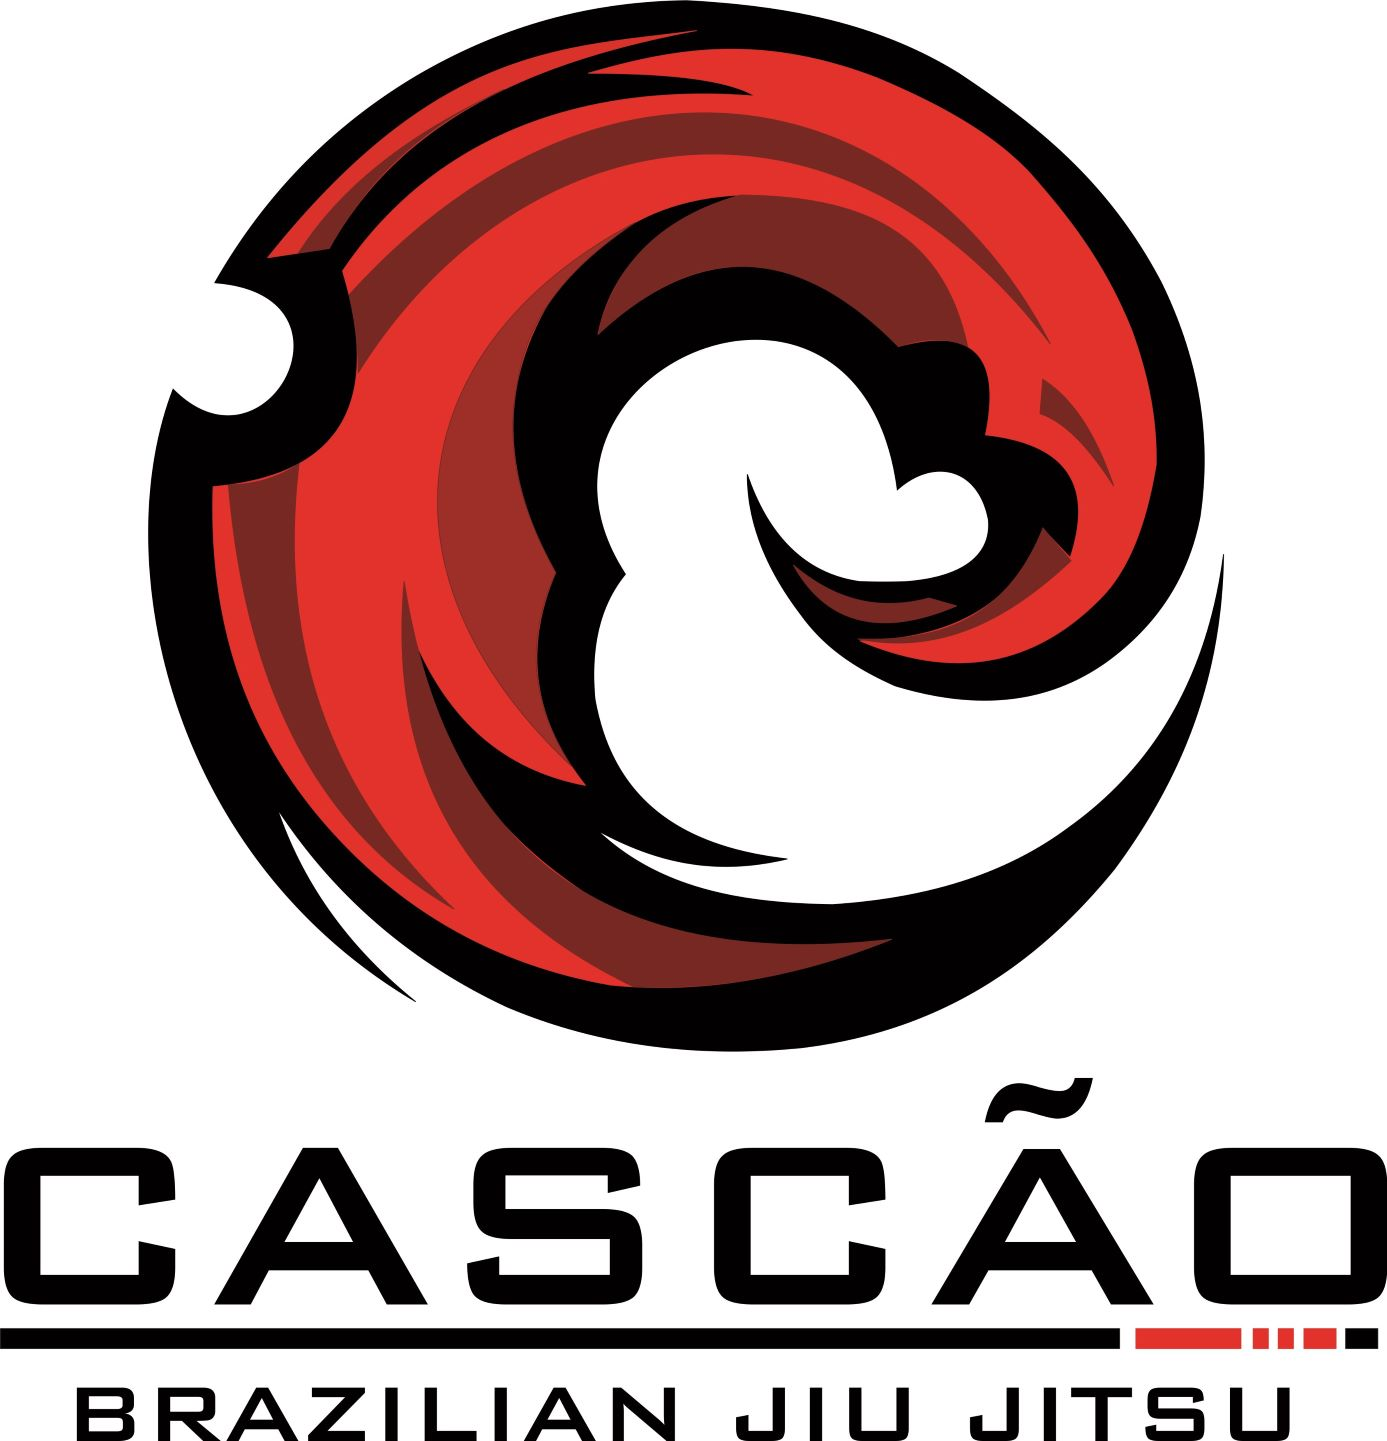 Cascao Jiu Jitsu